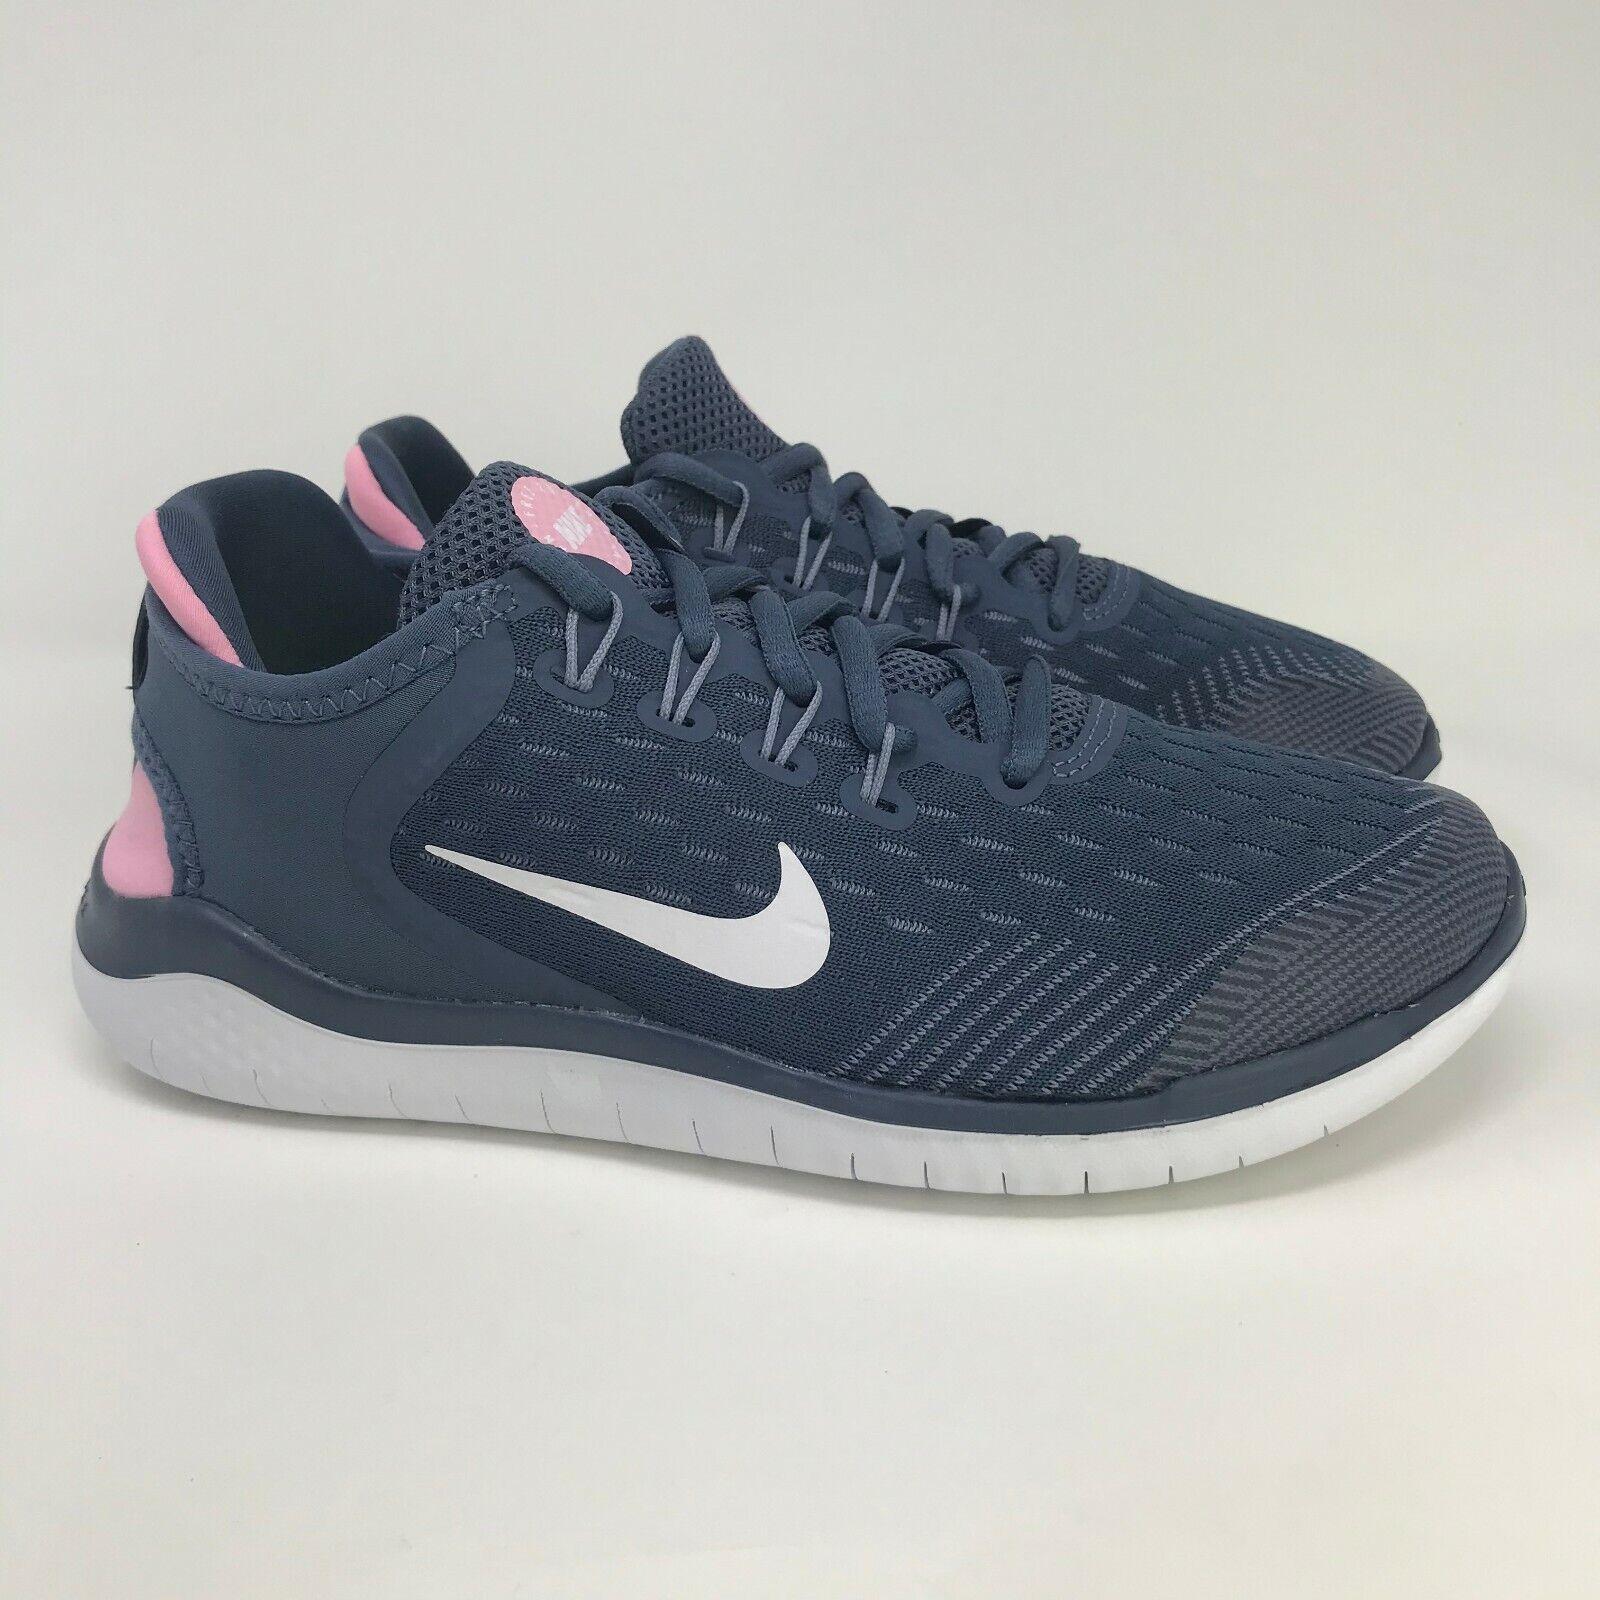 Nike YOUTH Free RN 2018 (GS) AH3457-402